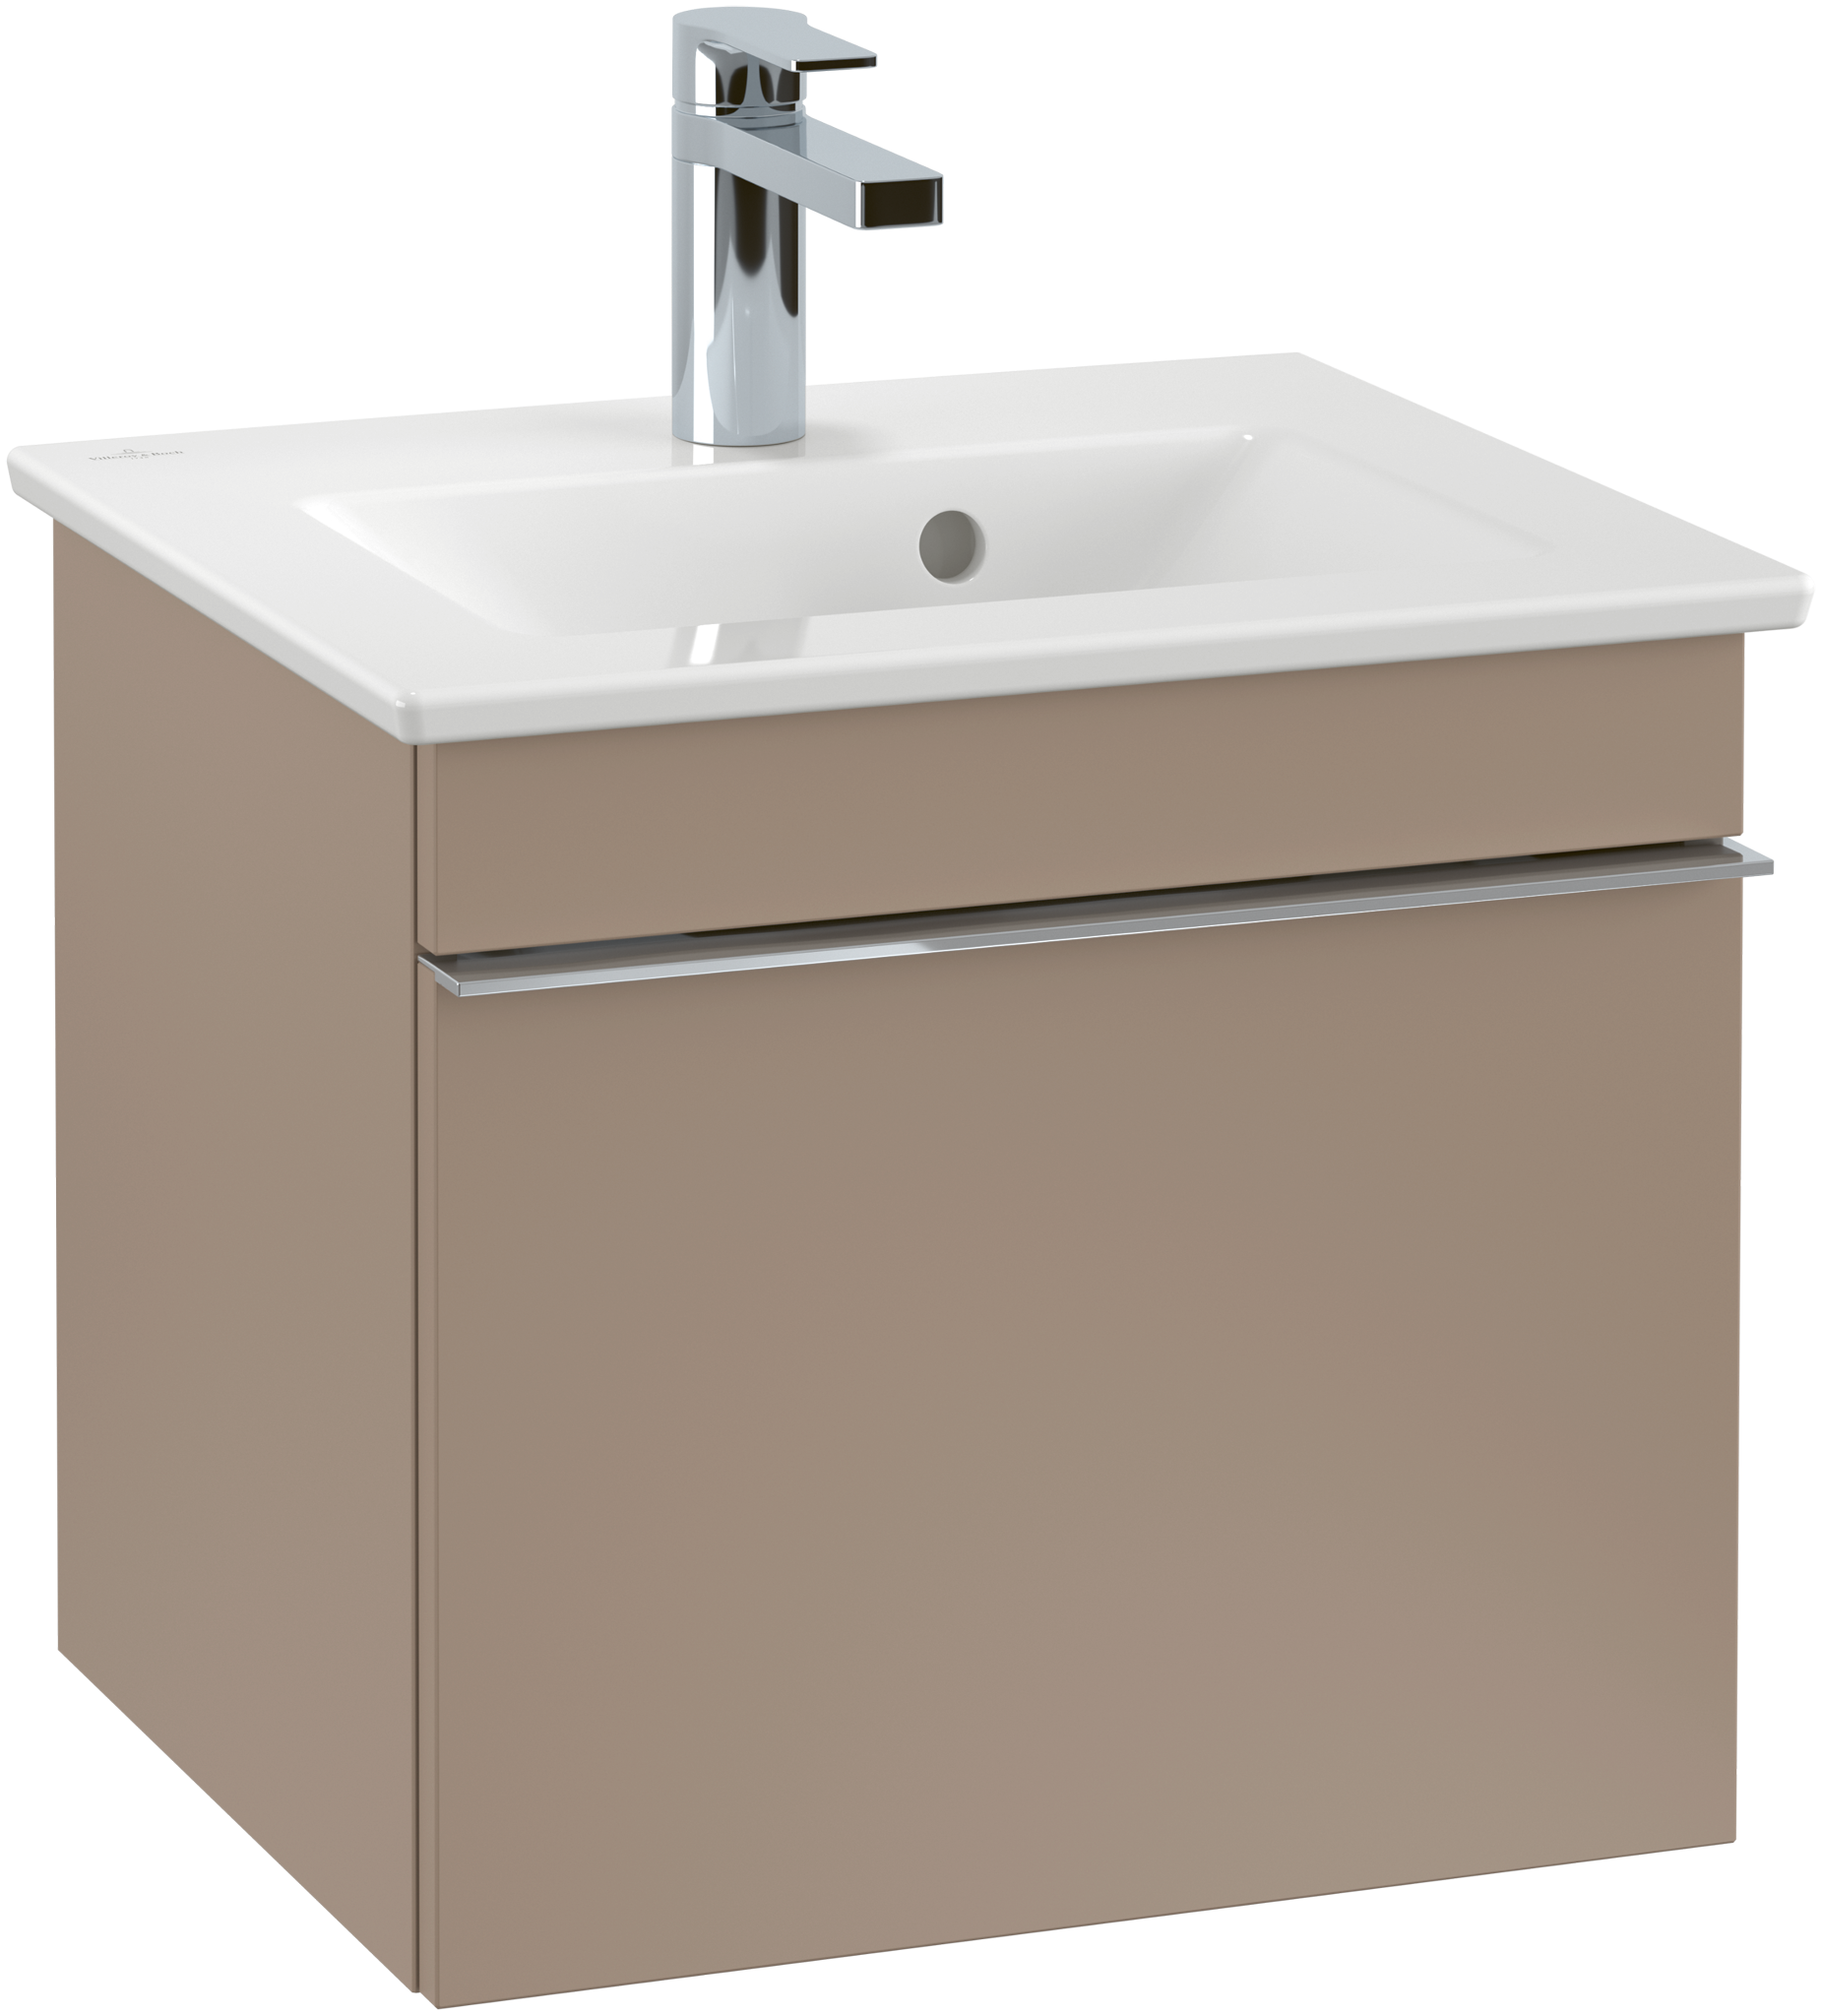 Venticello Bathroom Furniture Vanity Unit For Washbasin Bathroom Sink Cabinets